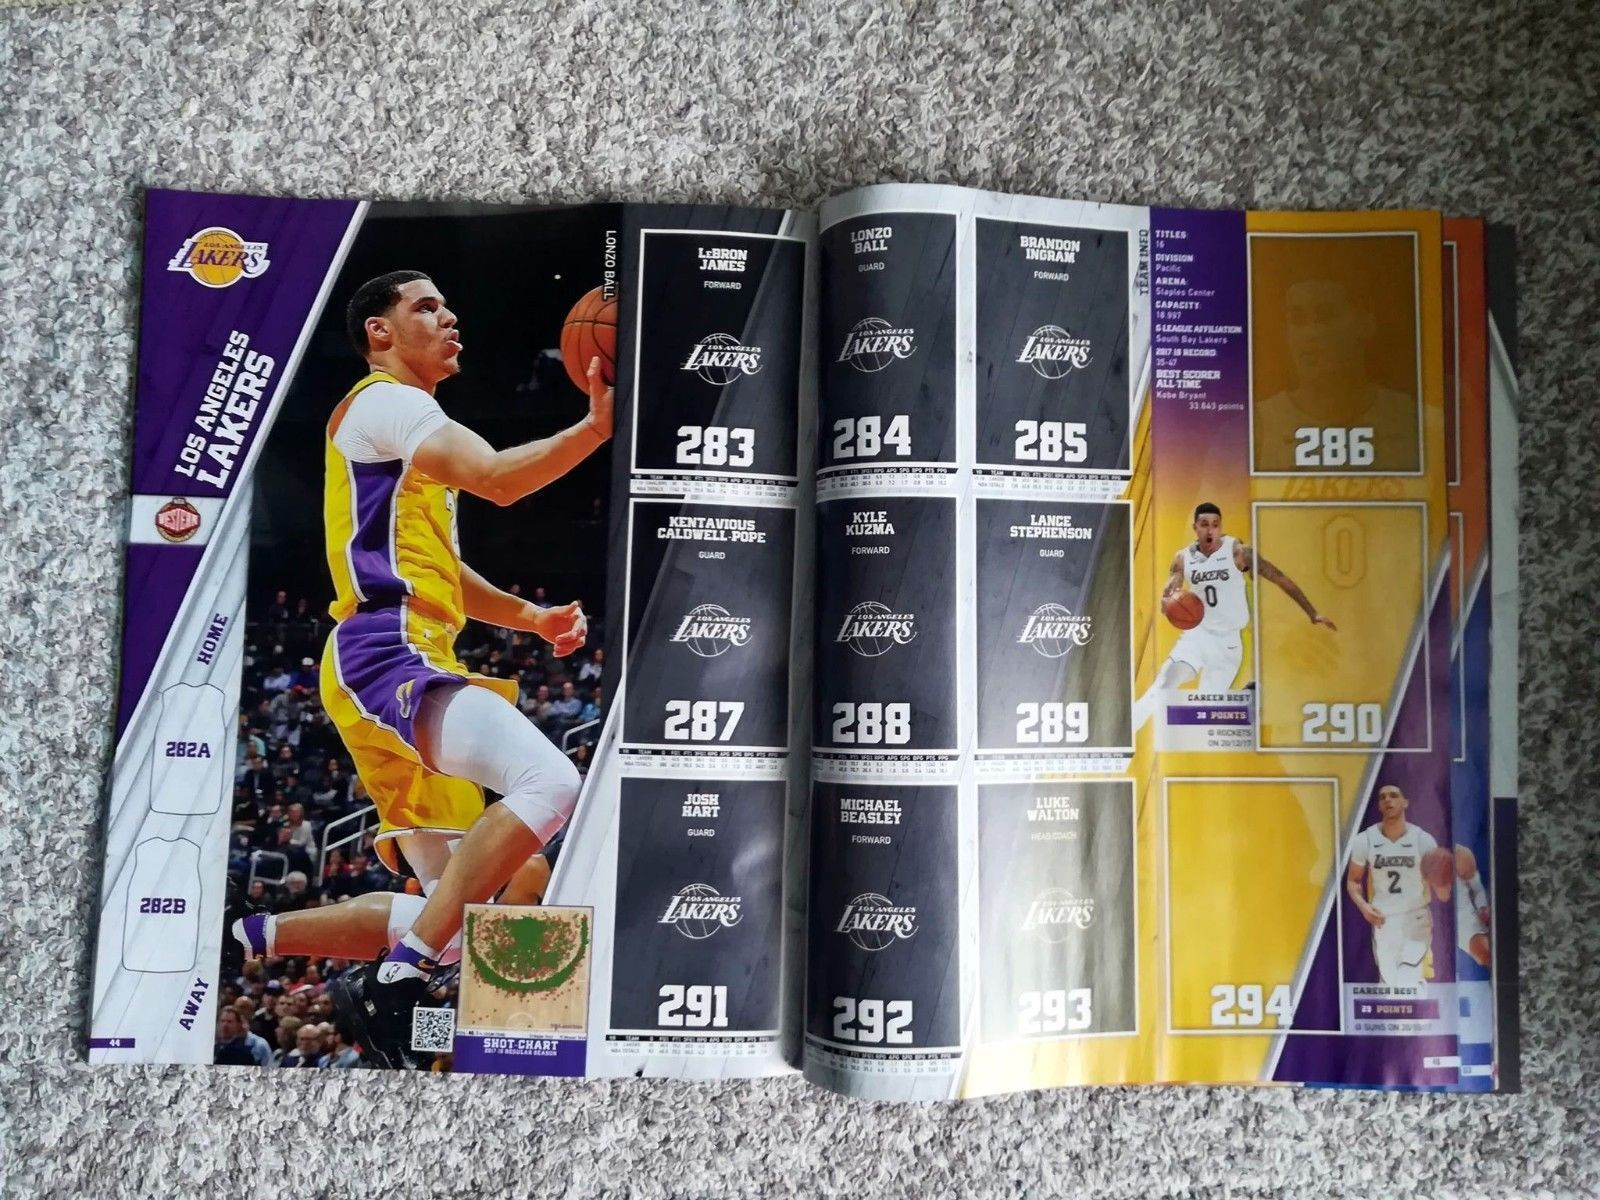 New Nba Basketball Panini 2018 2019 18 19 Empty Sticker Album Leeralbum Vuoto Ebay Sticker Album Nba Basketball Basketball Cards [ 1200 x 1600 Pixel ]